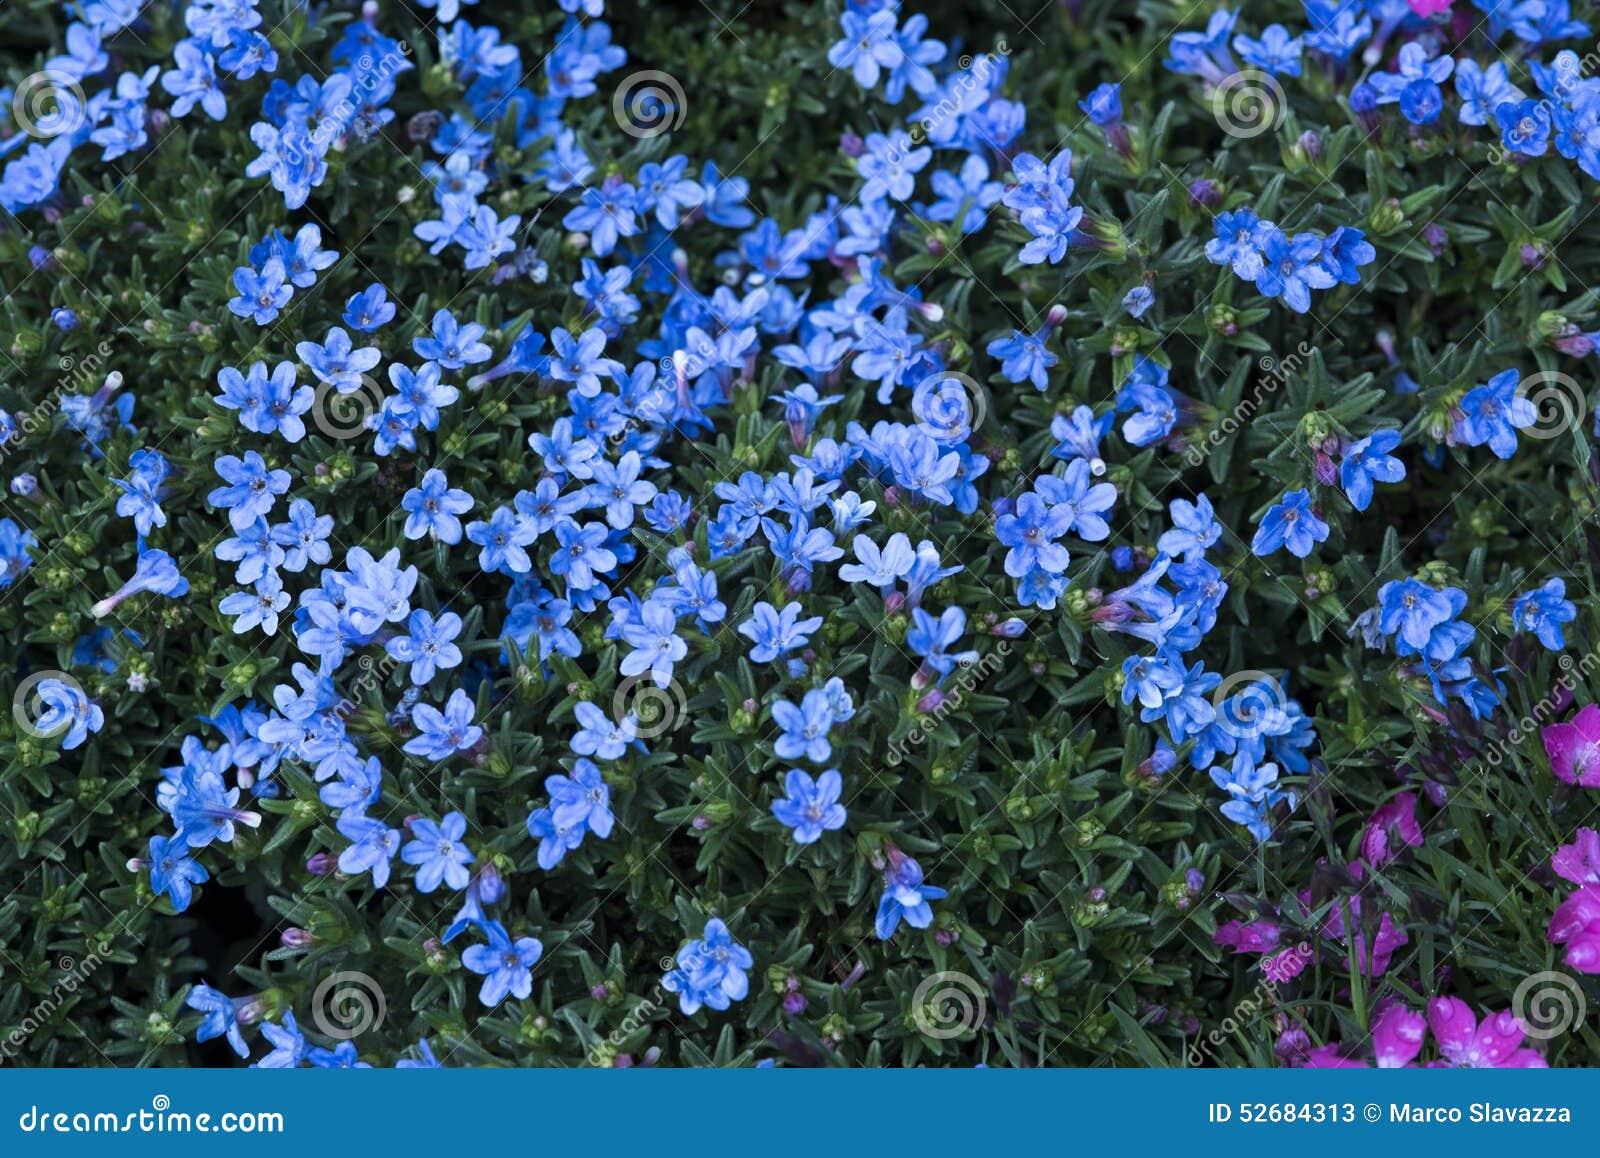 petites fleurs bleues image stock image du groupe vert 52684313. Black Bedroom Furniture Sets. Home Design Ideas